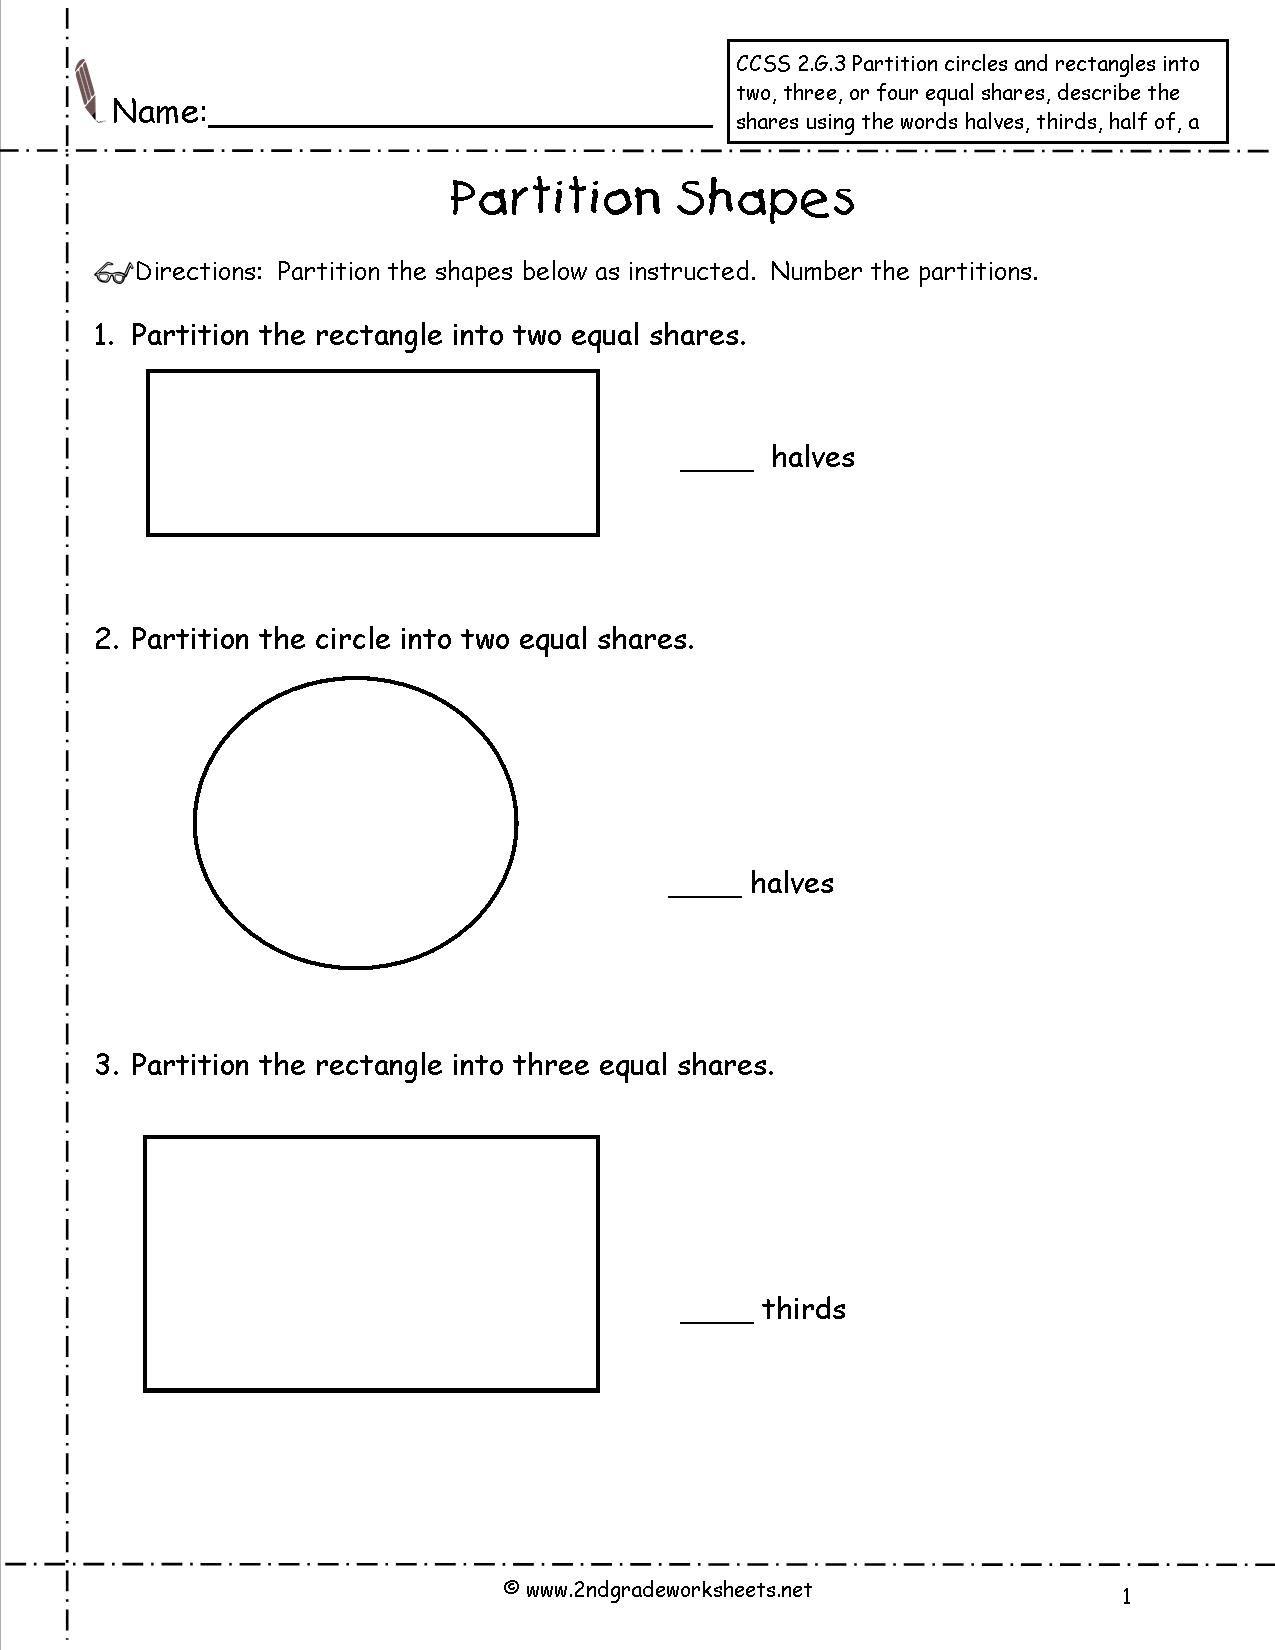 Dividing Shapes Into Equal Parts Worksheet Google Search